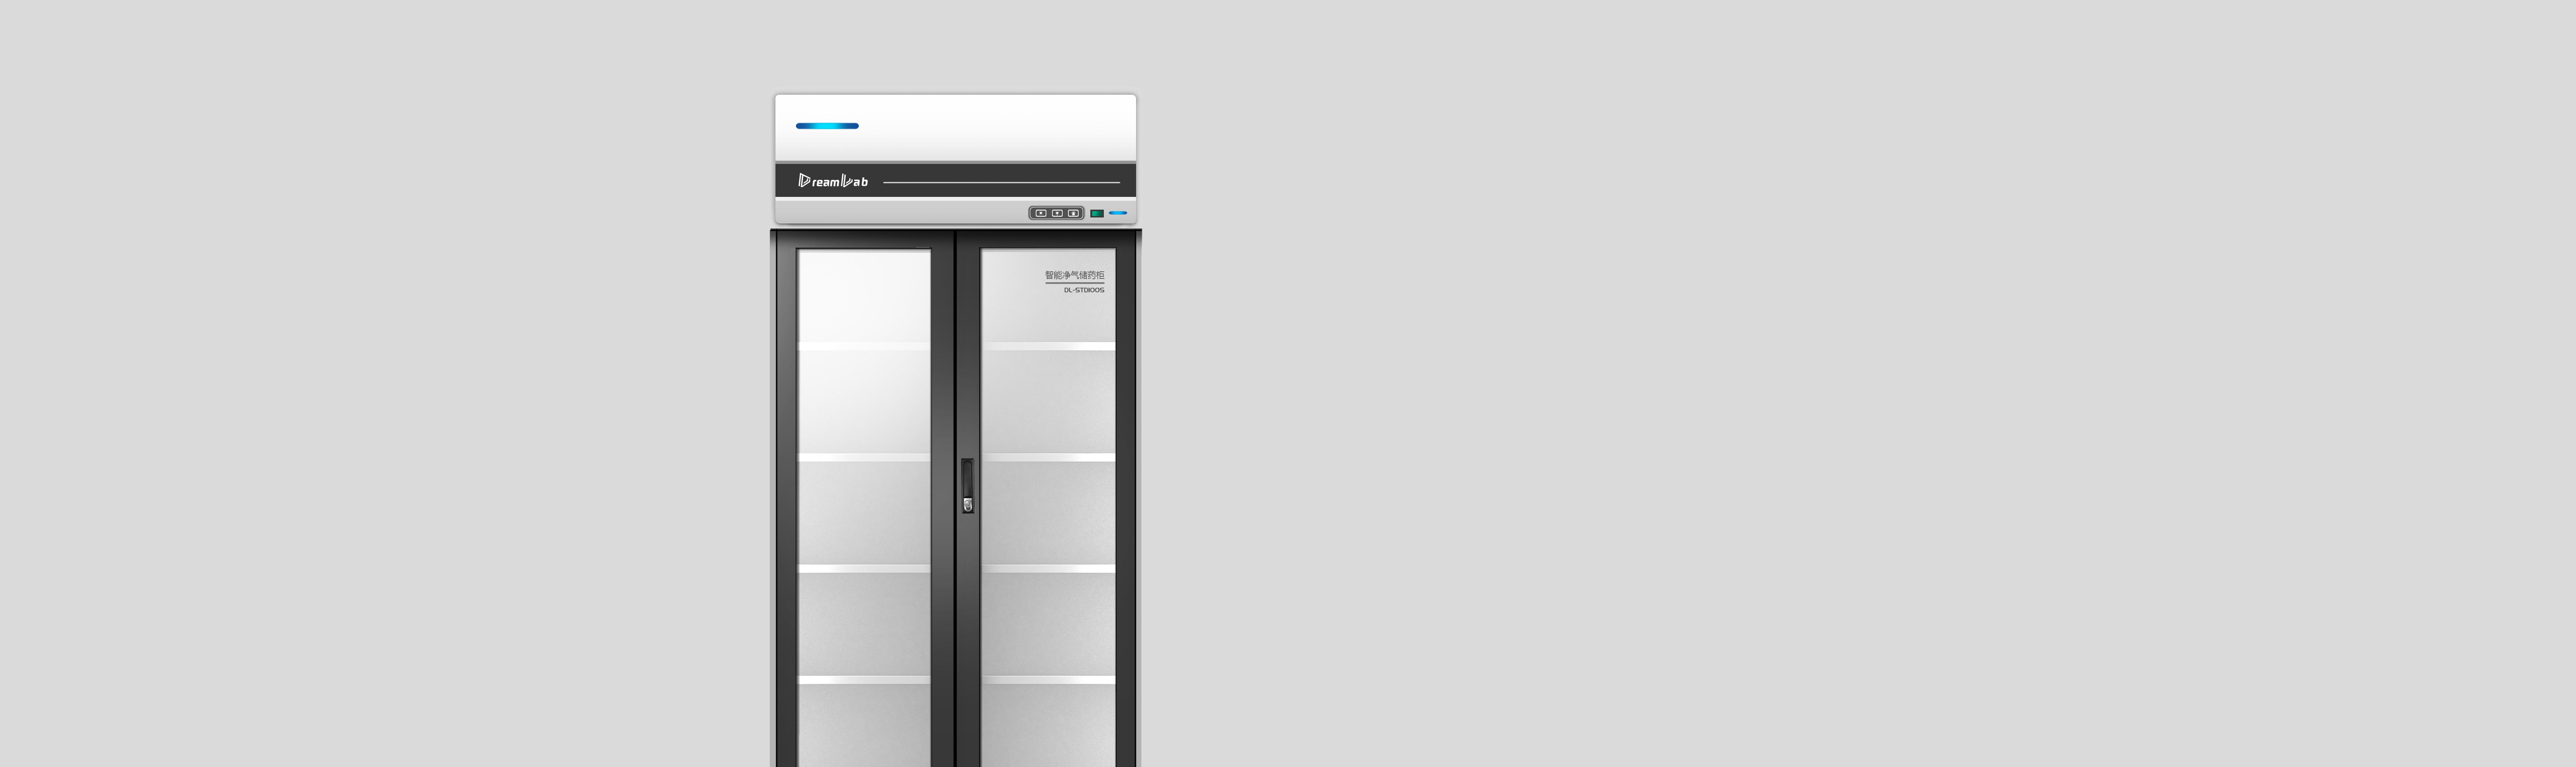 SSC设计-单门净气型储药柜